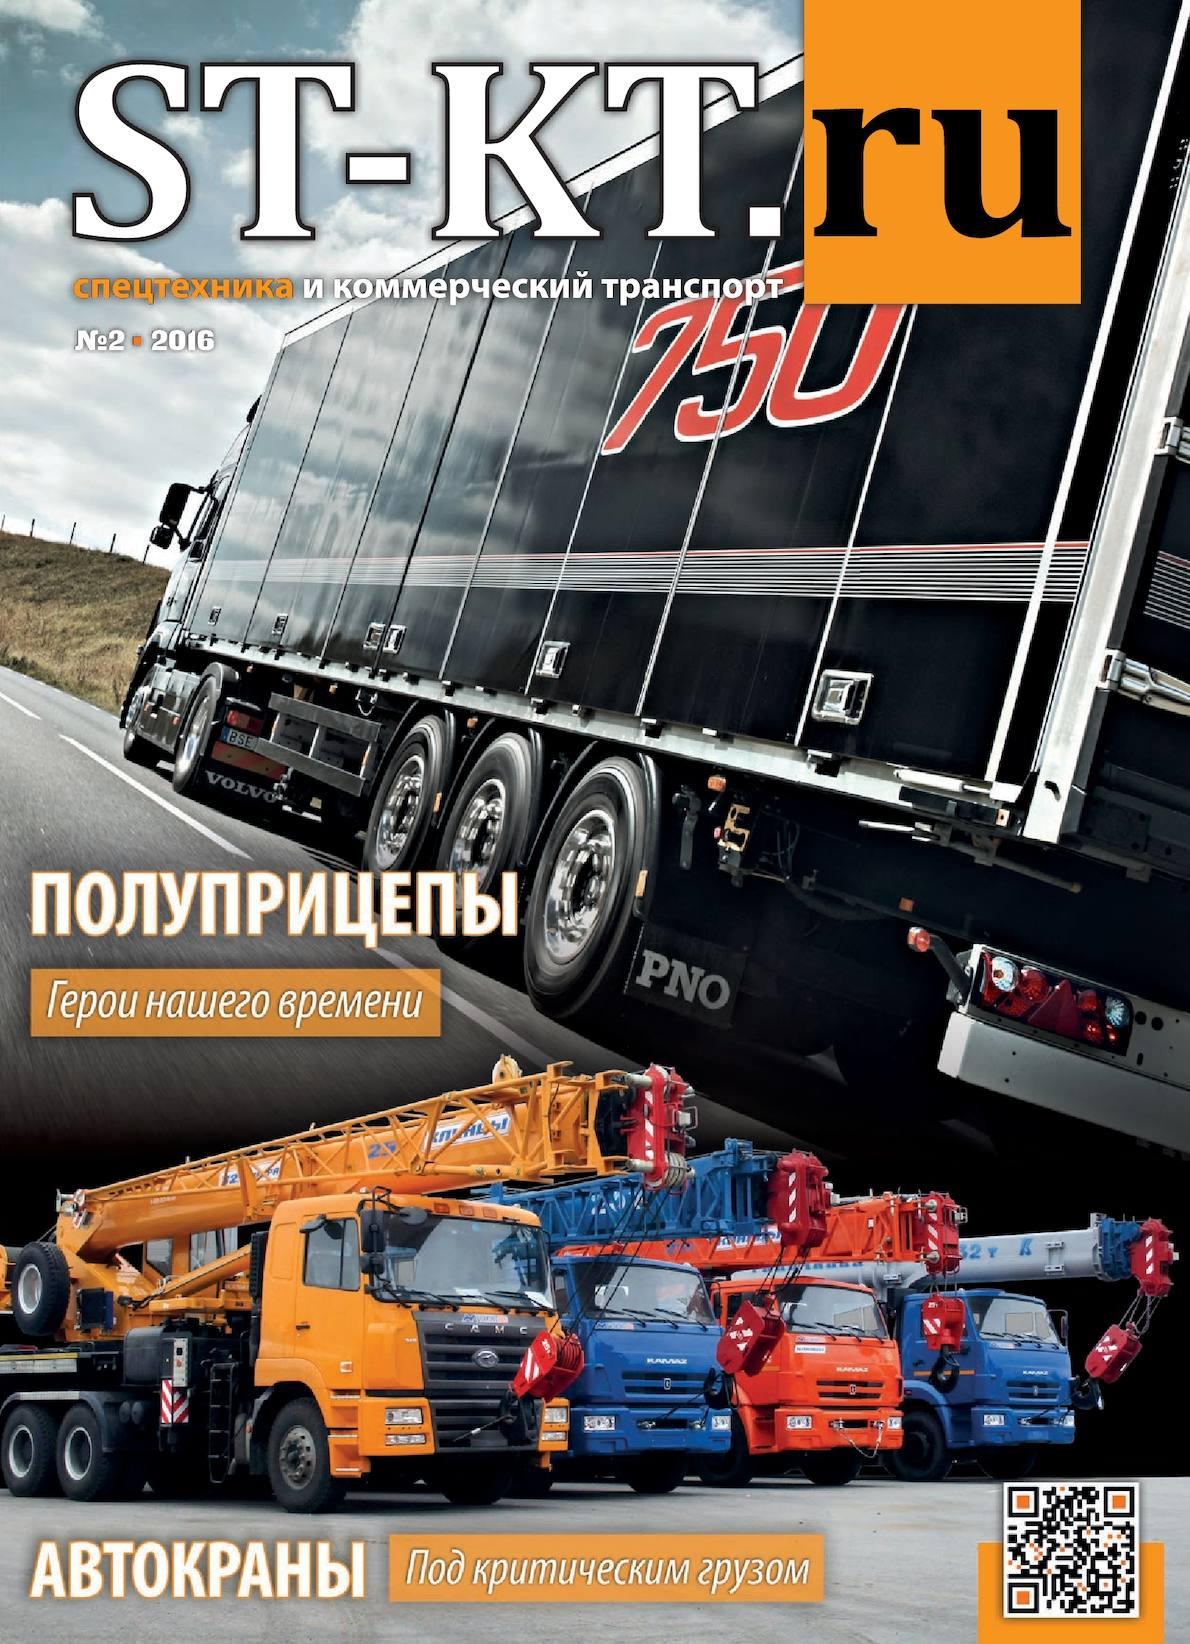 СпецТехника и Коммерческий Транспорт №2/2016